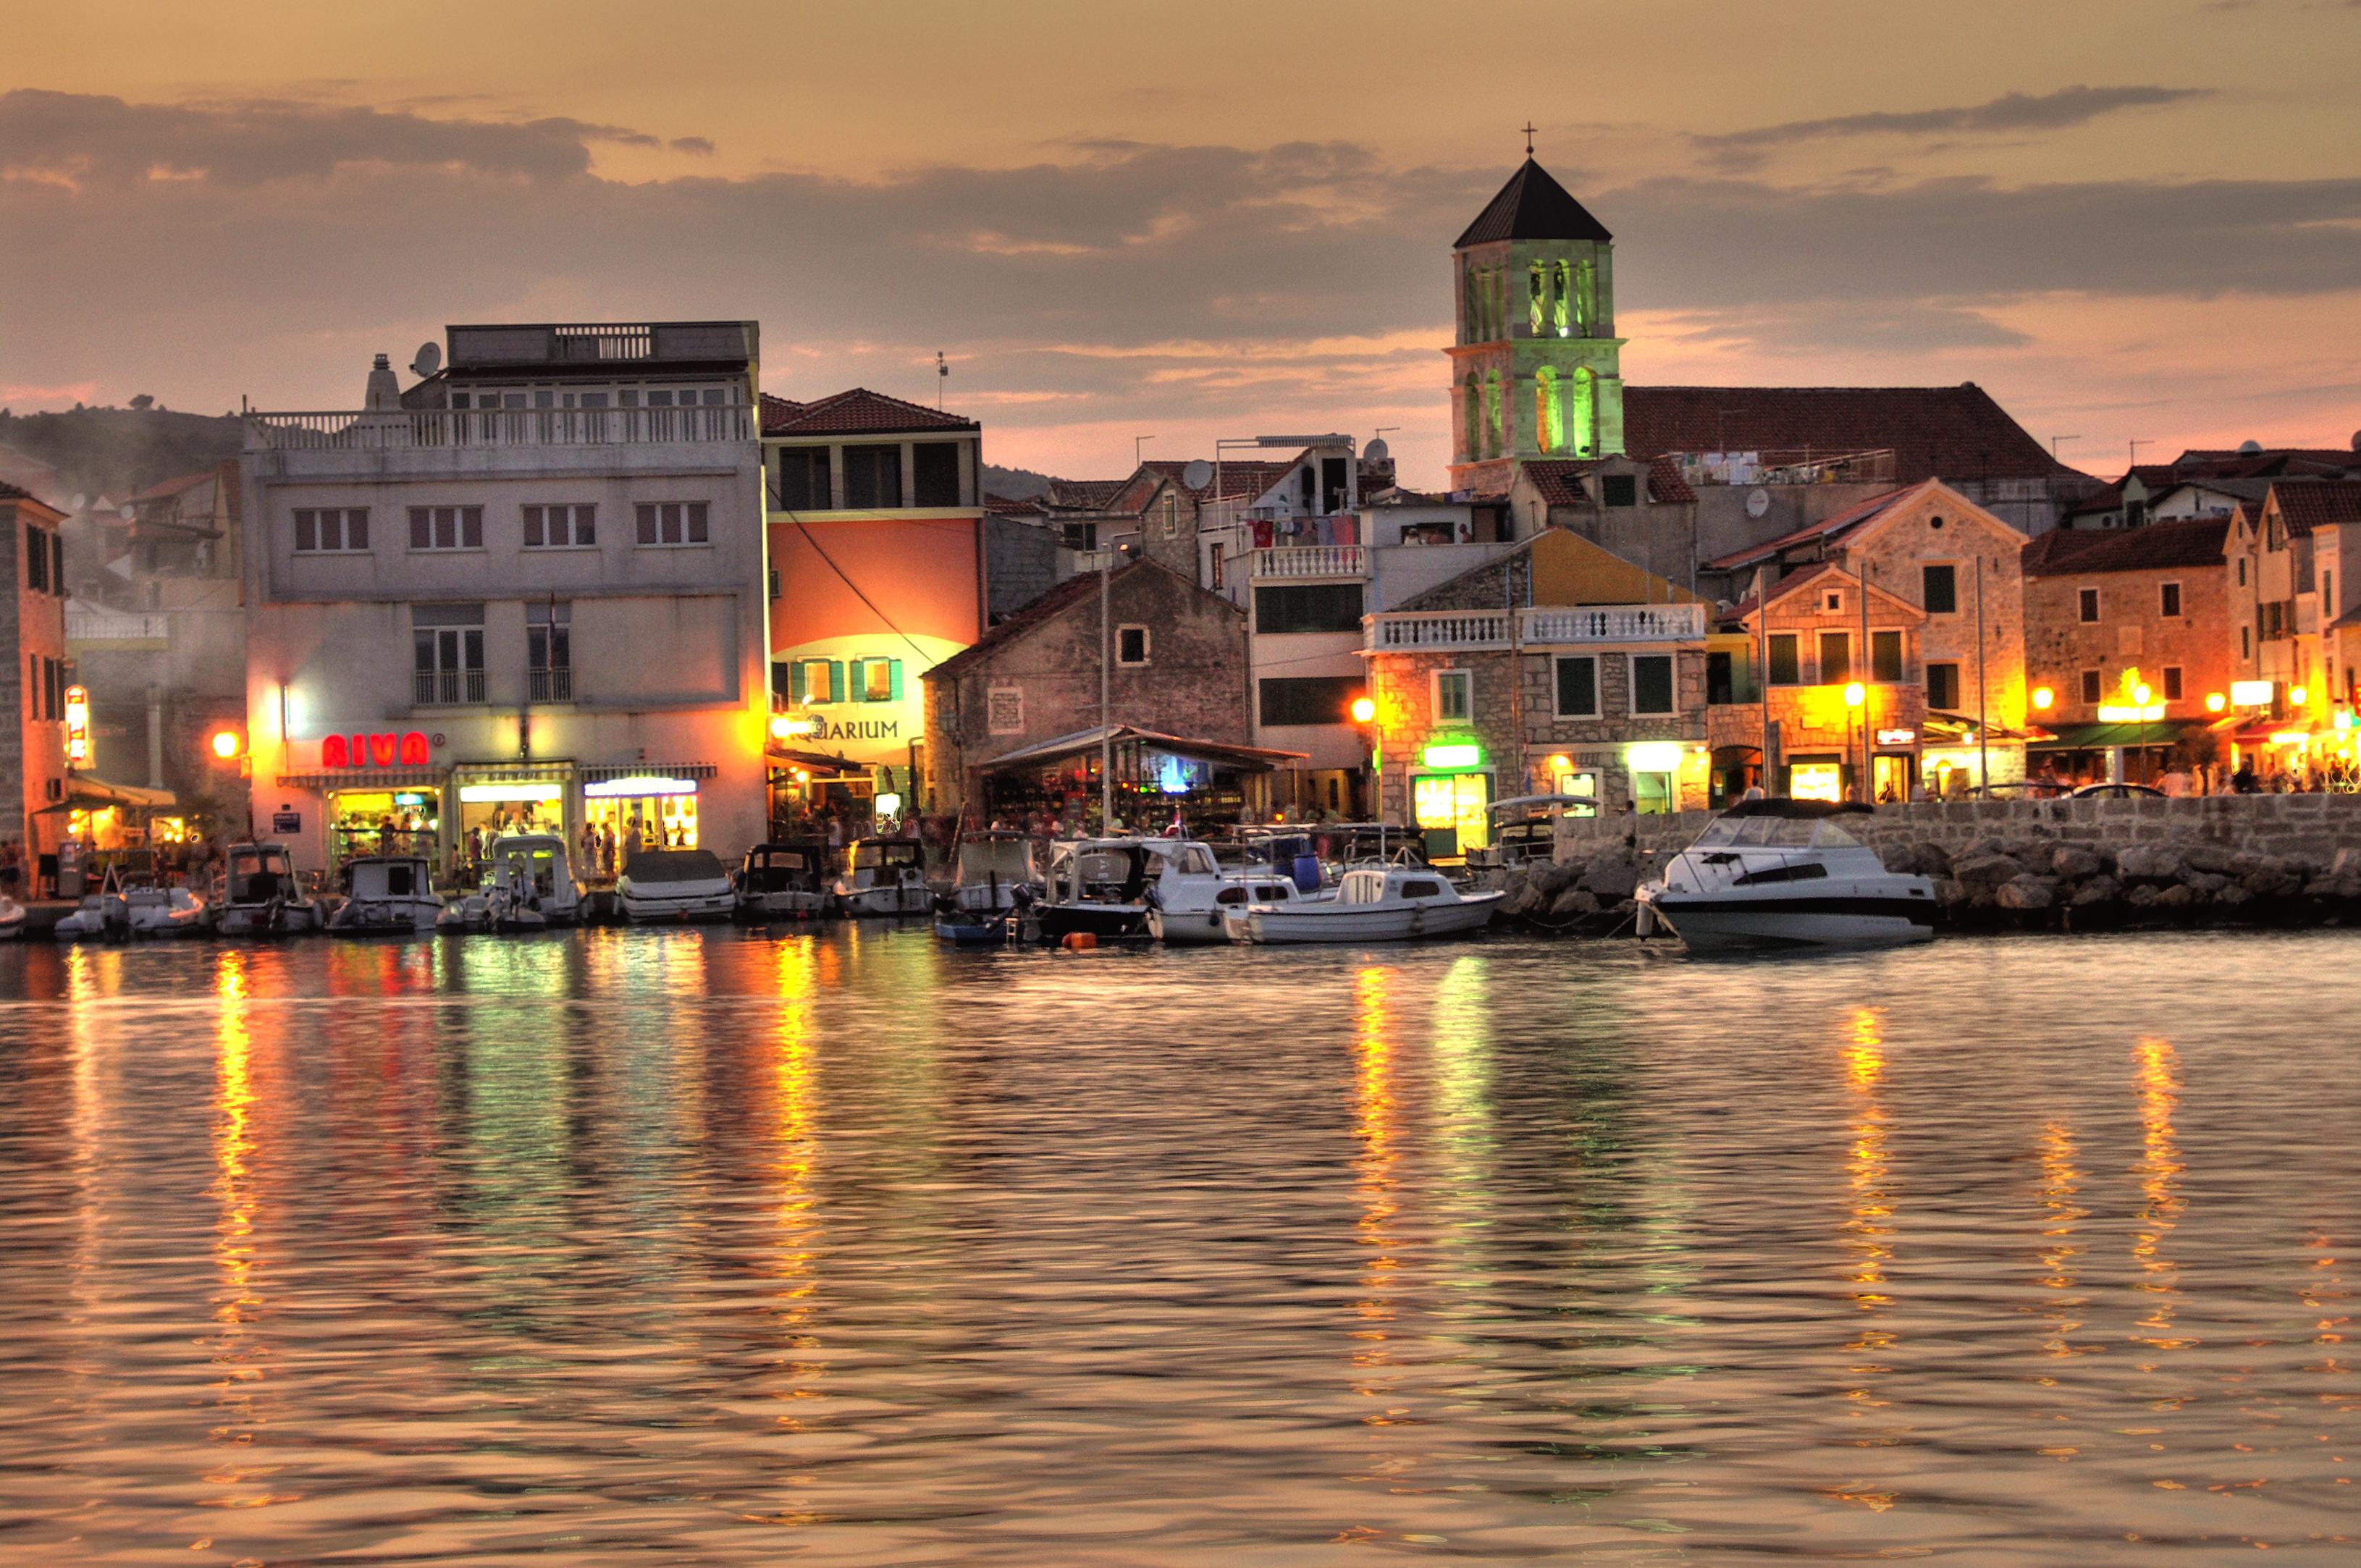 Noleggio Barche Vodice - Navalia | Noleggia un Sogno